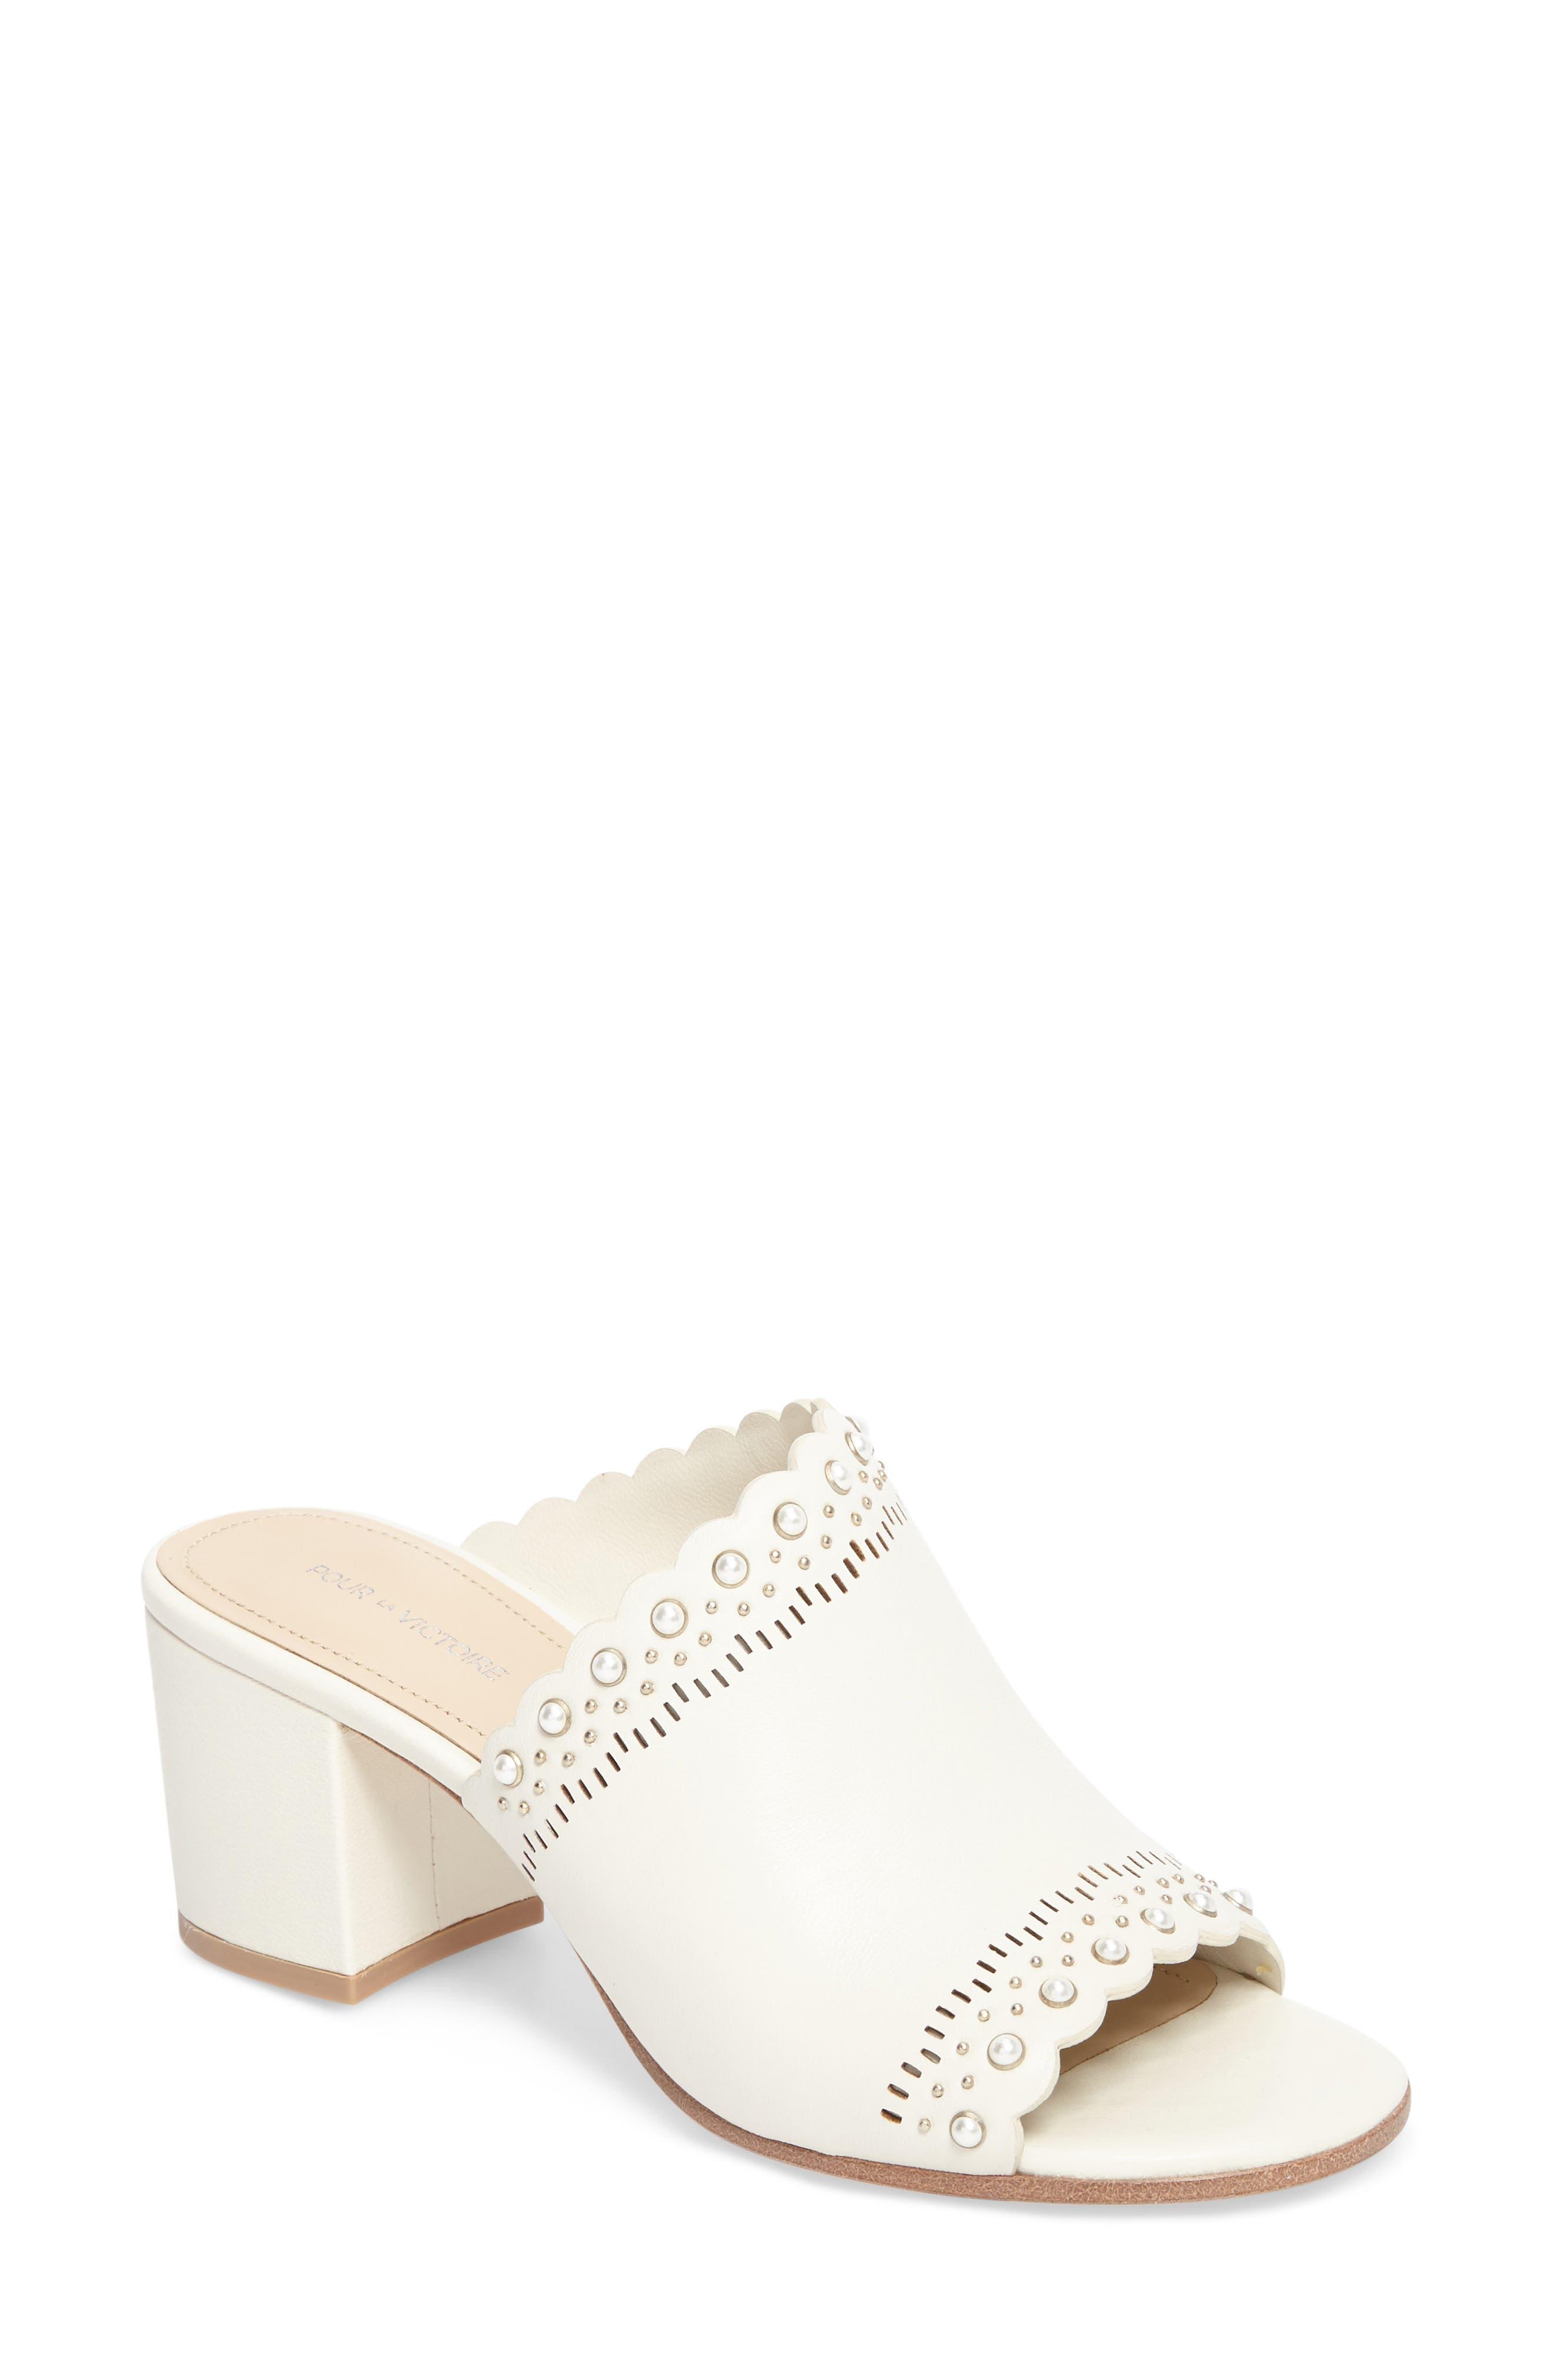 Amela Embellished Slide Sandal,                             Main thumbnail 1, color,                             Bone Leather